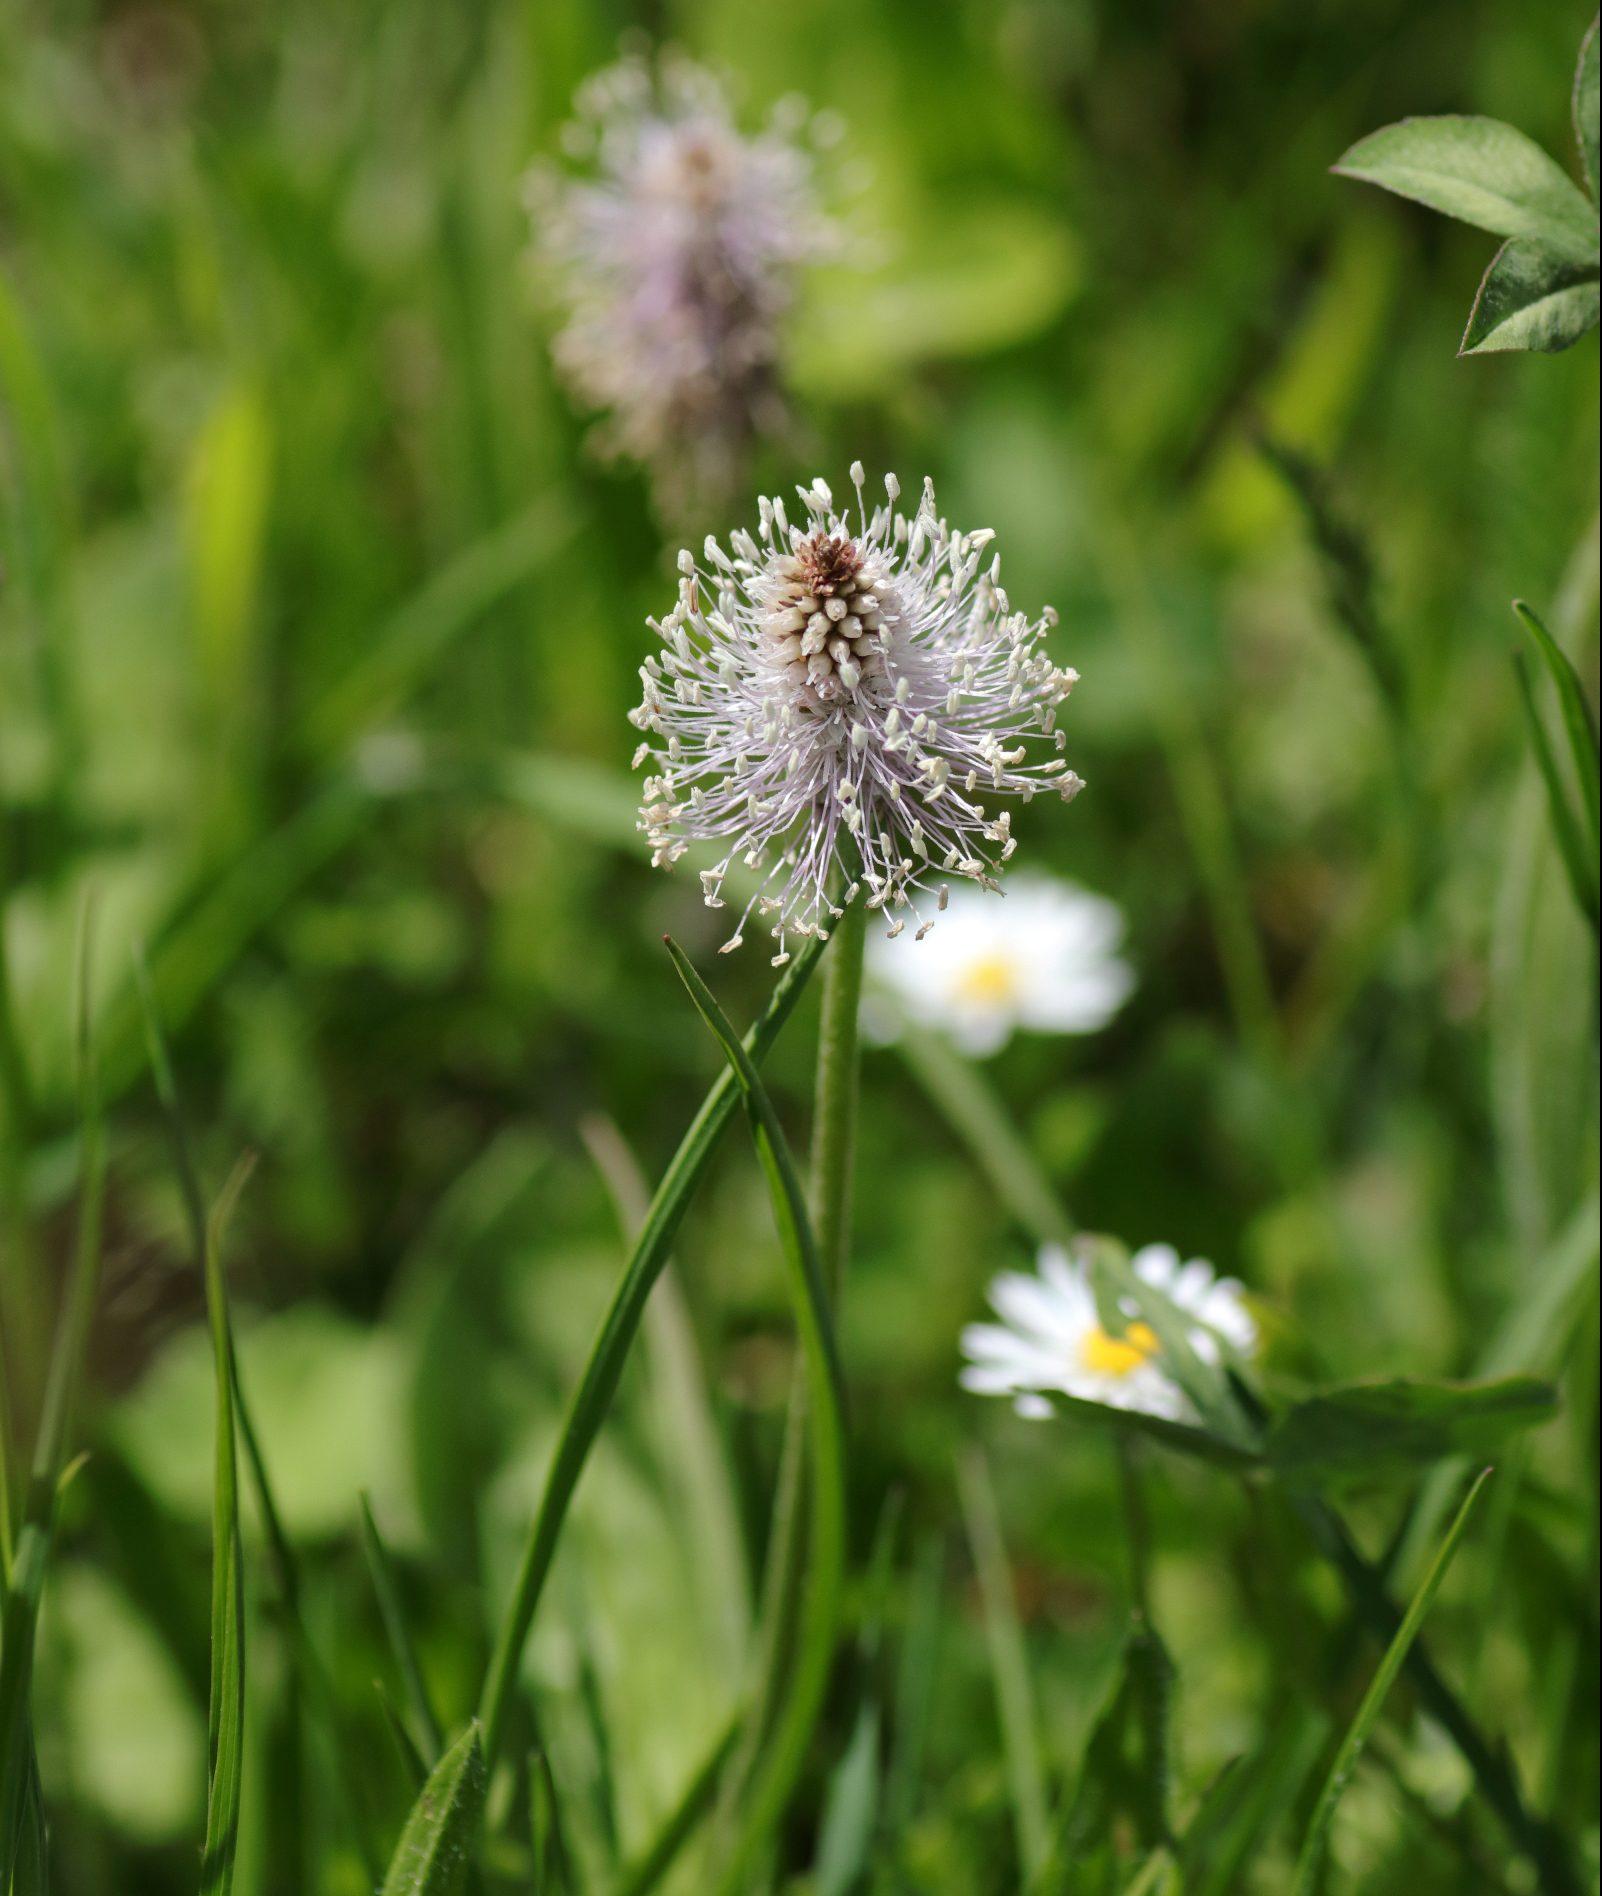 Mittlerer Wegerich - Blüte